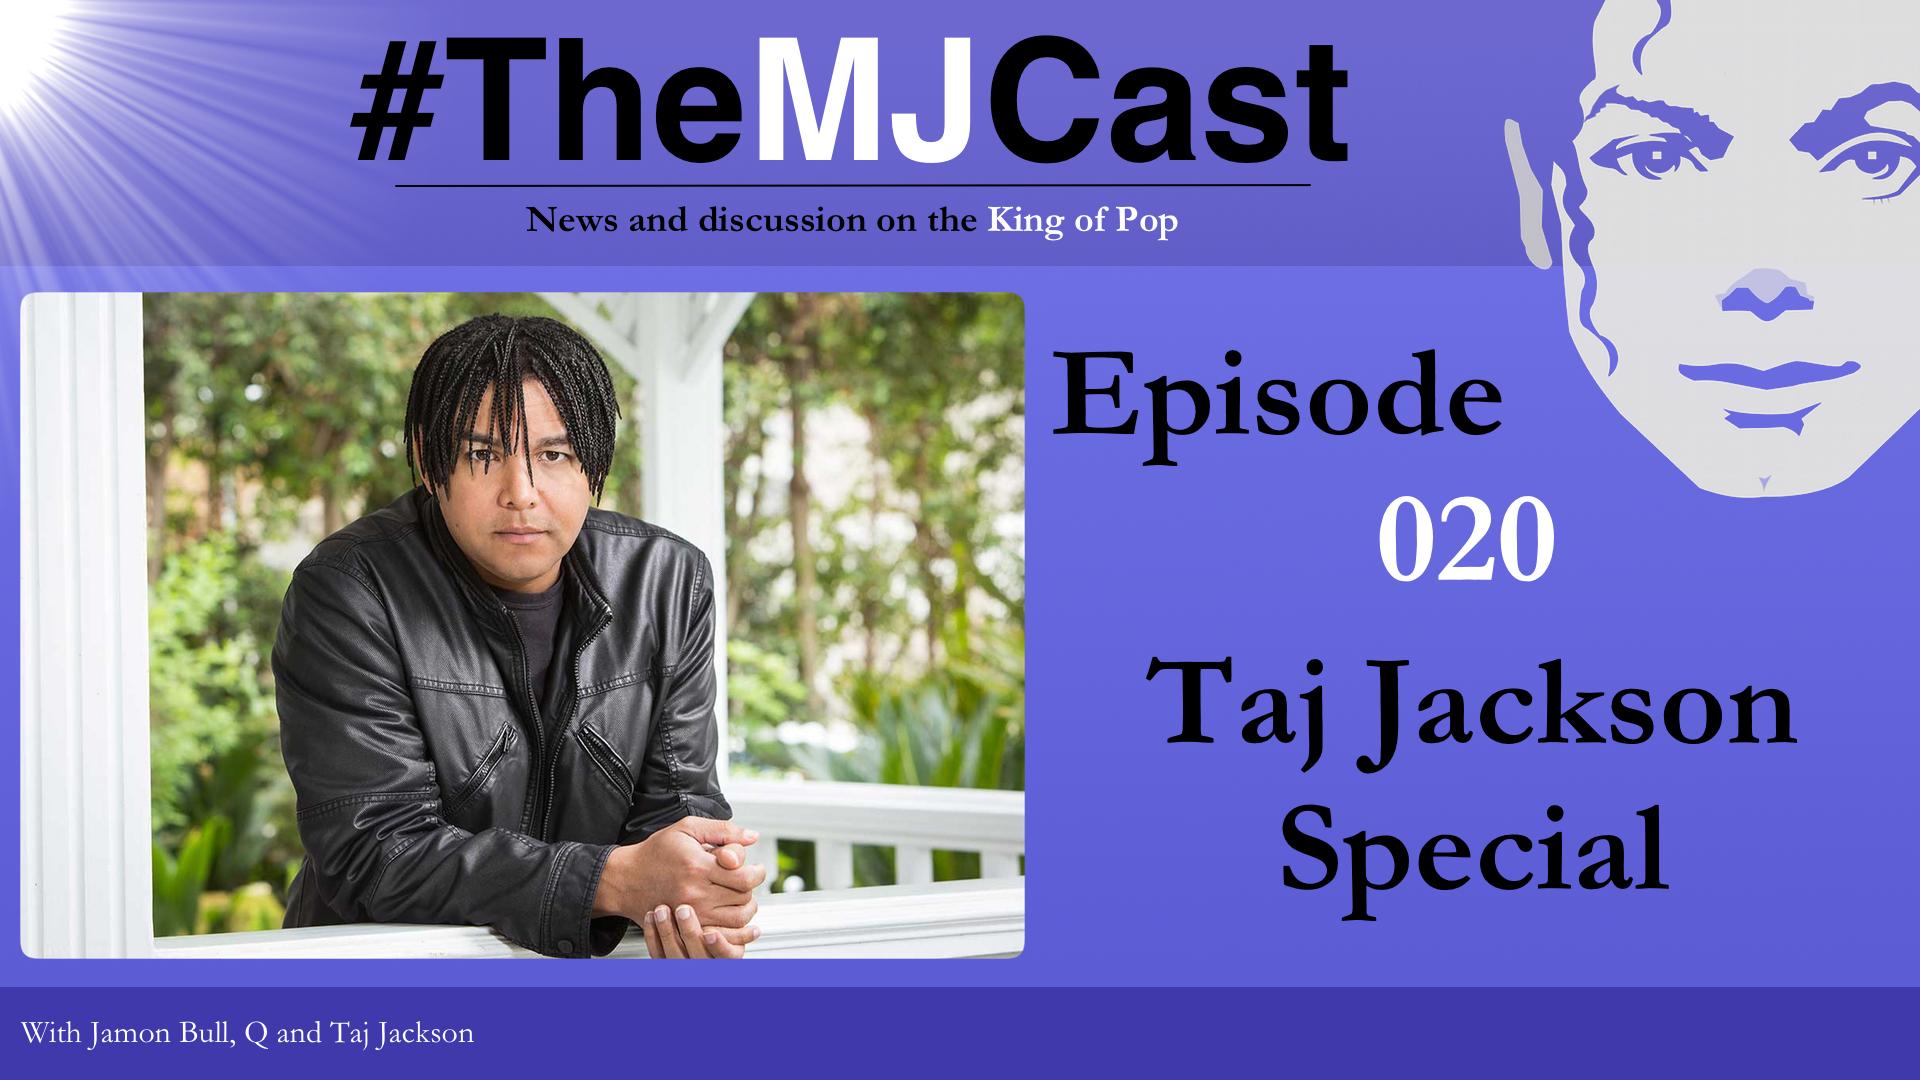 Episode 020 Taj Jackson Special The Mjcast